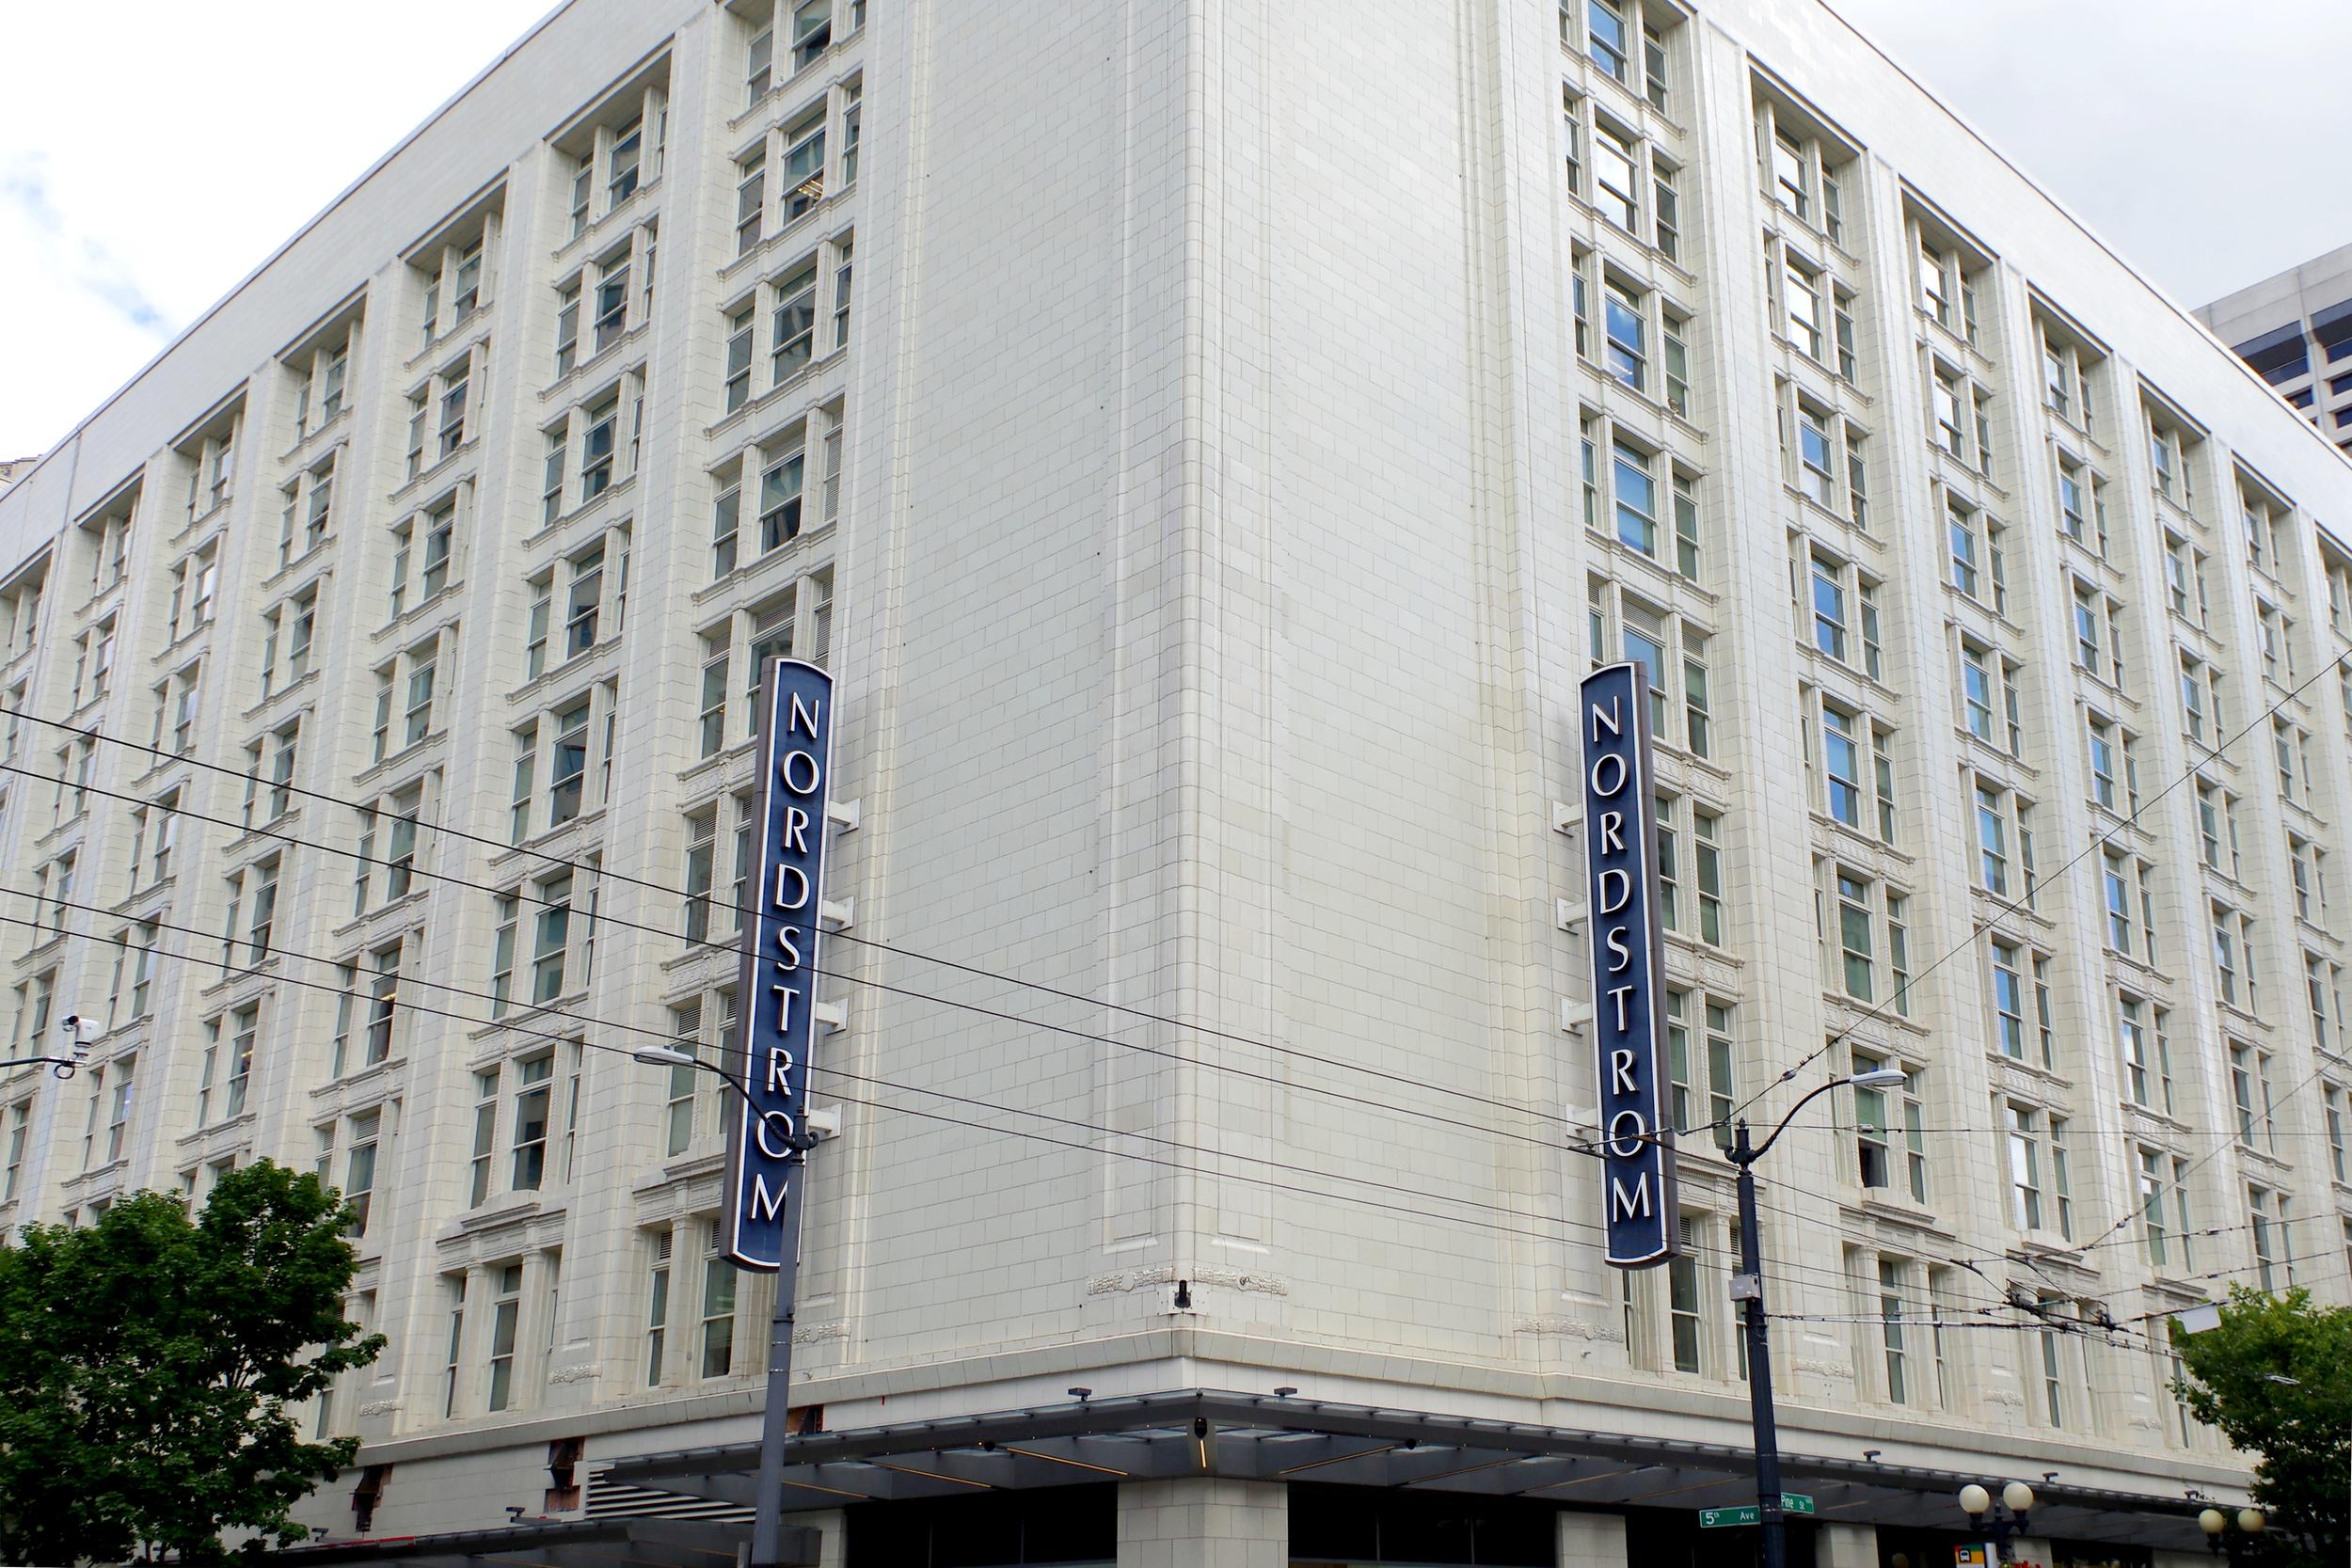 nordstrom flagship store